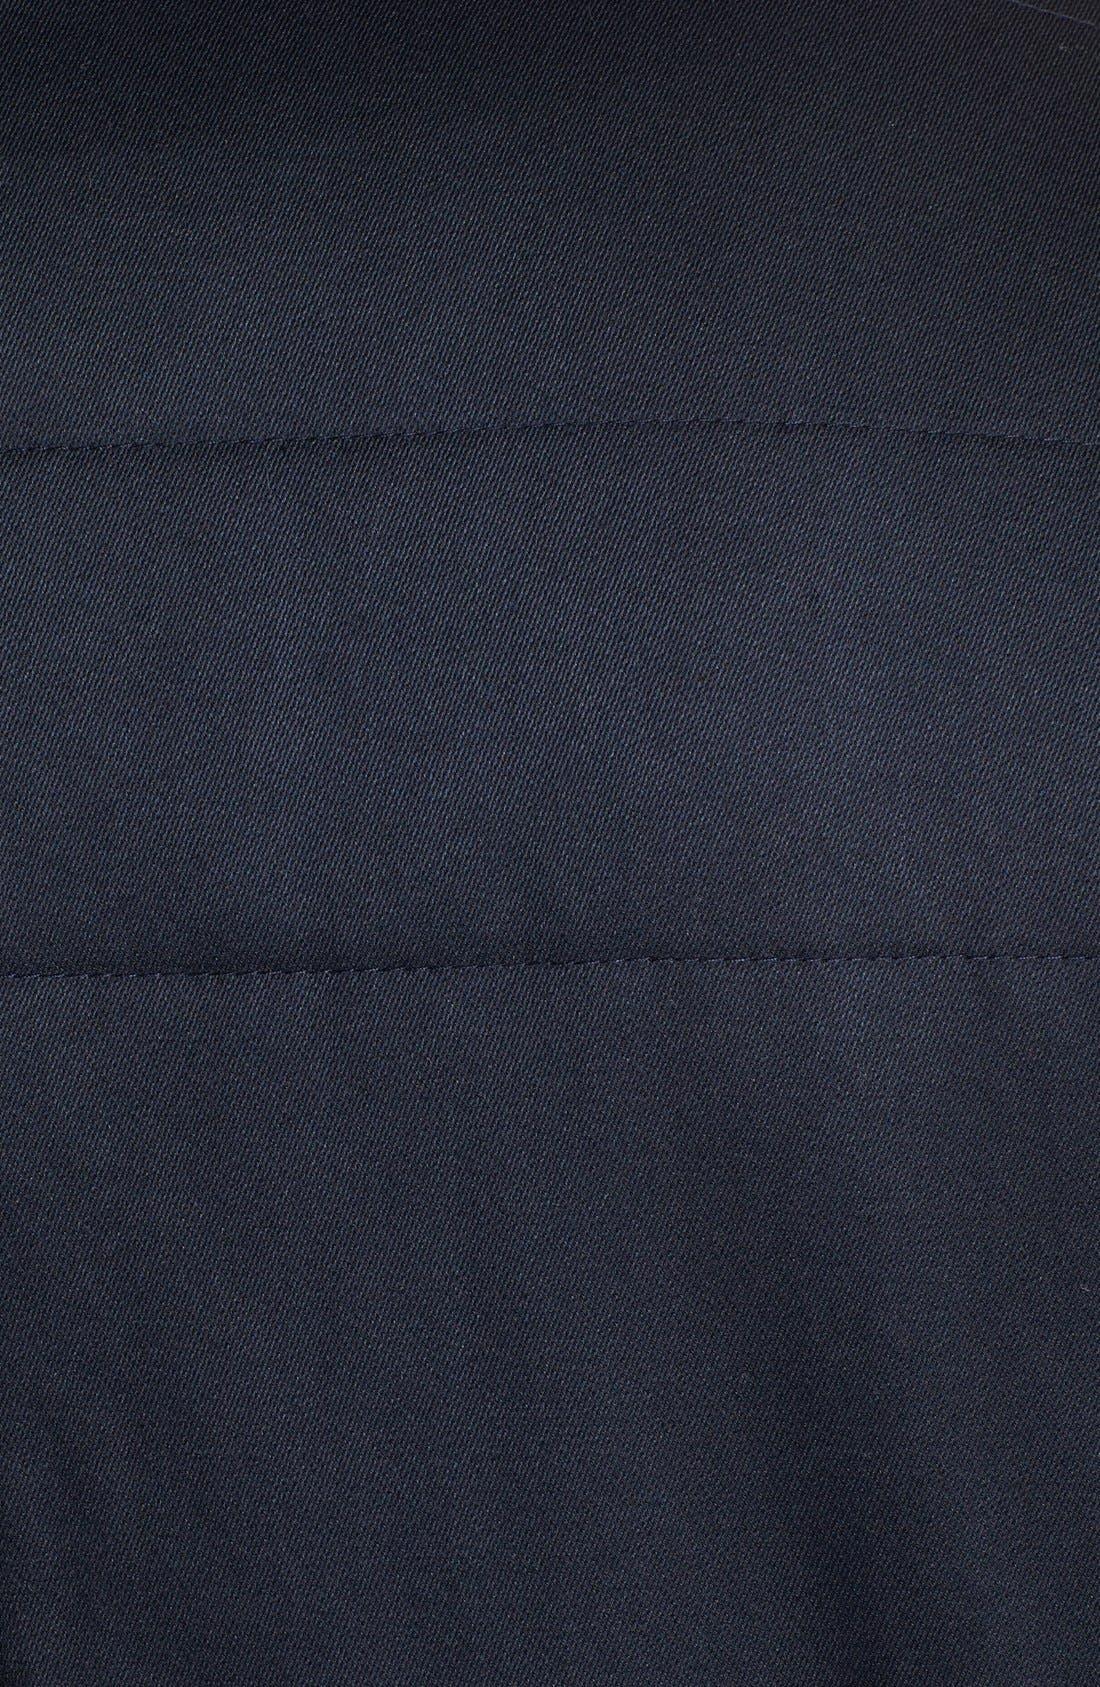 Alternate Image 3  - Antony Morato Slim Fit Double Breasted Jacket